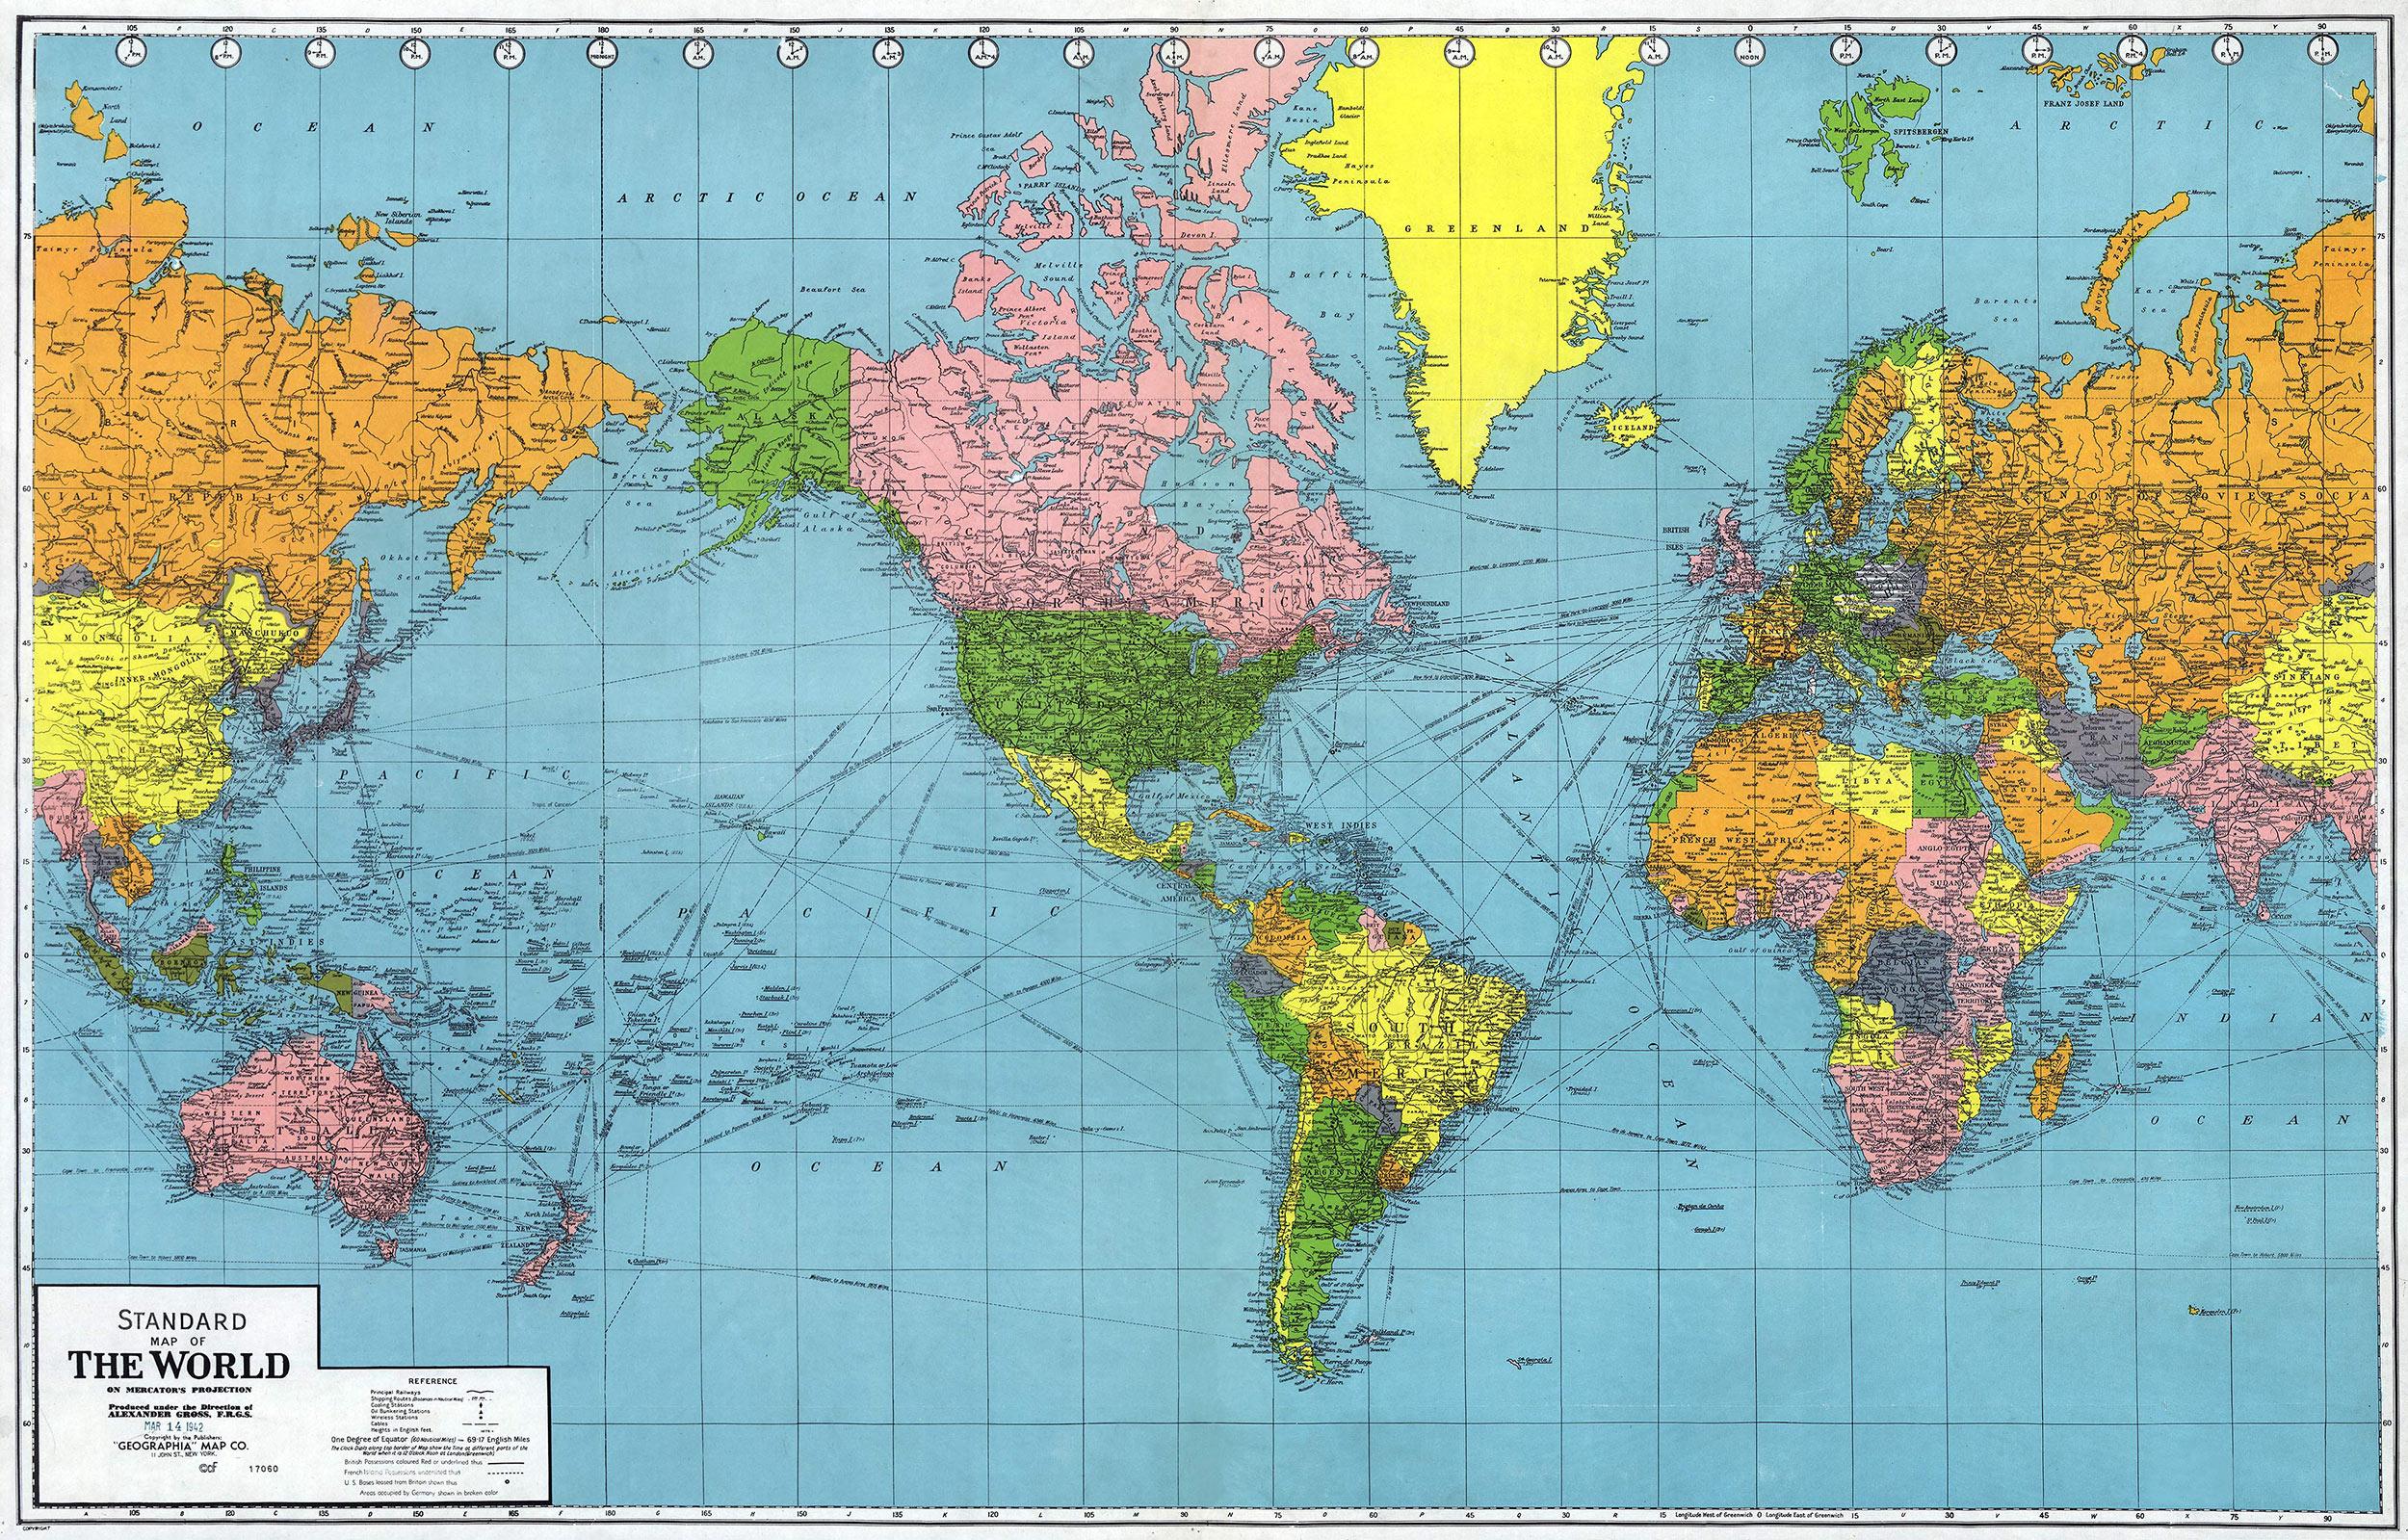 wwwmuralswallpapercoukcapital city world map wallpaper mural 2500x1599